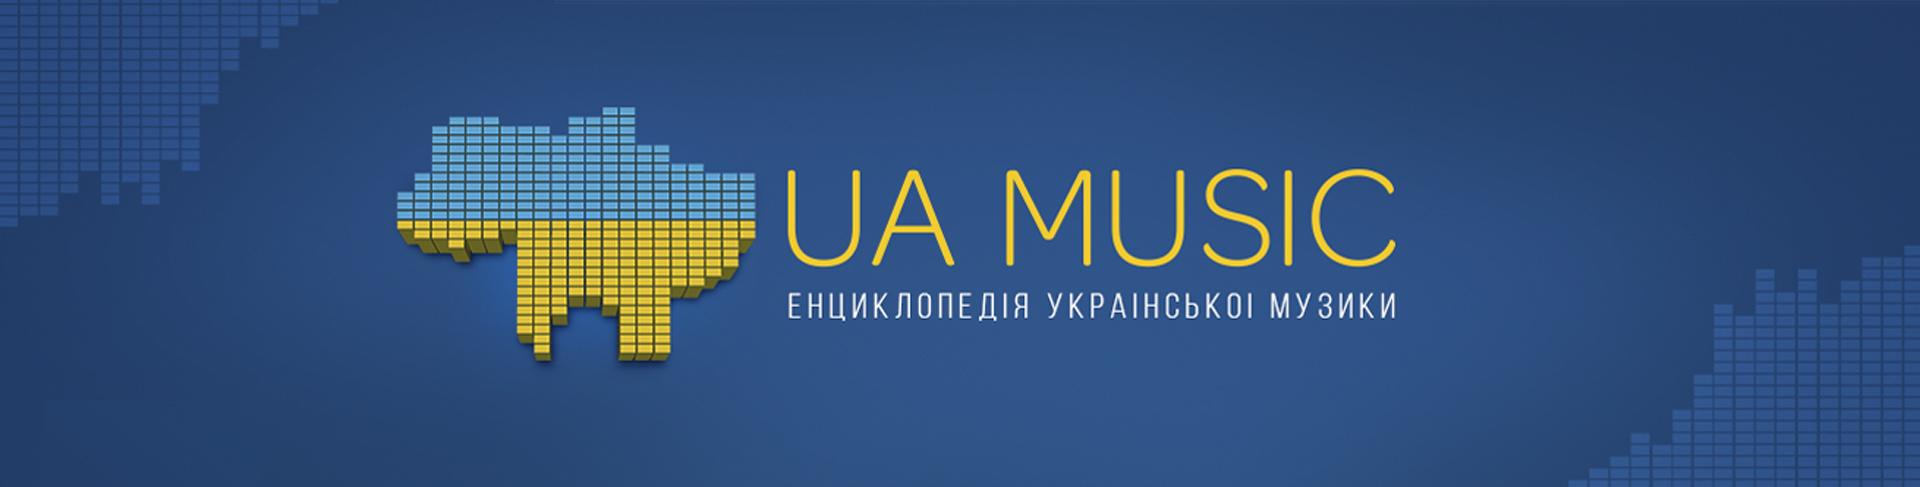 1920 Ummagma — UA MUSIC | Енциклопедія української музики